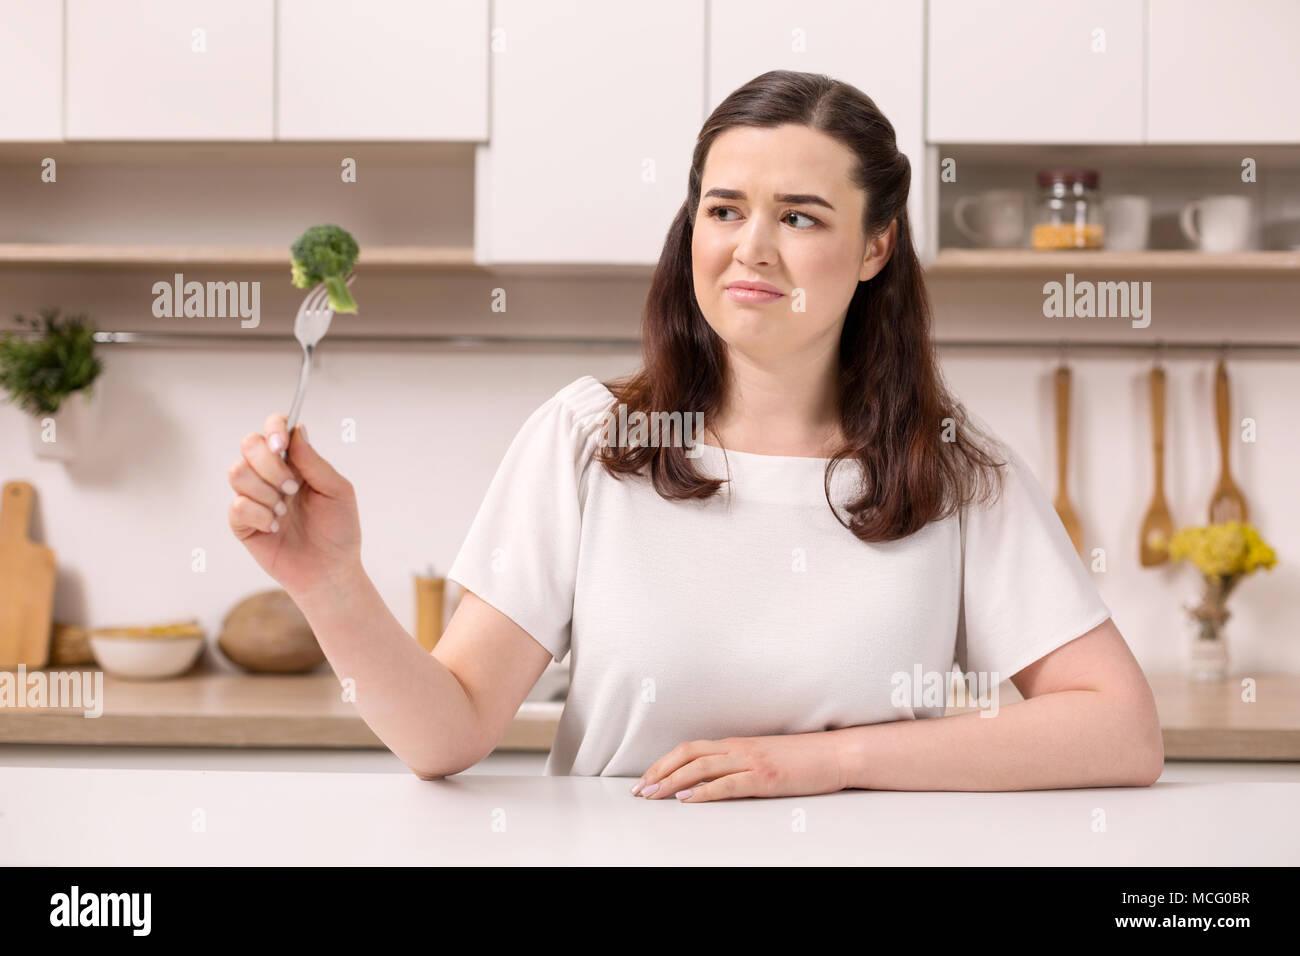 Upset sad woman controlling weight - Stock Image